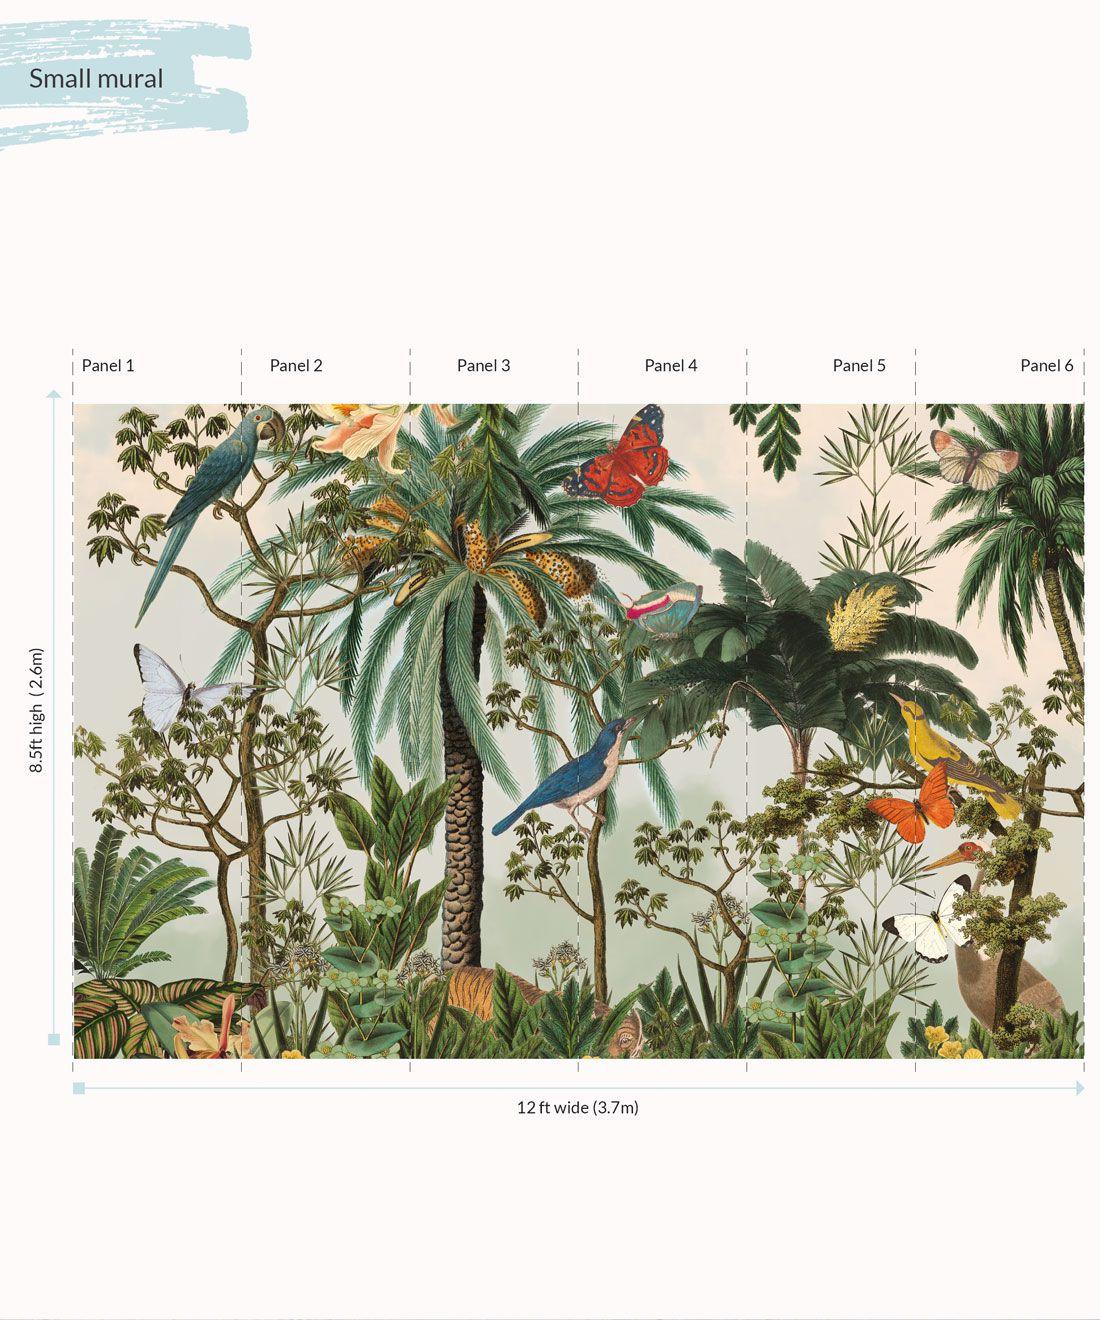 Heritage Jungle Mural • Tropical Jungle Animal Wallpaper • Small Panels